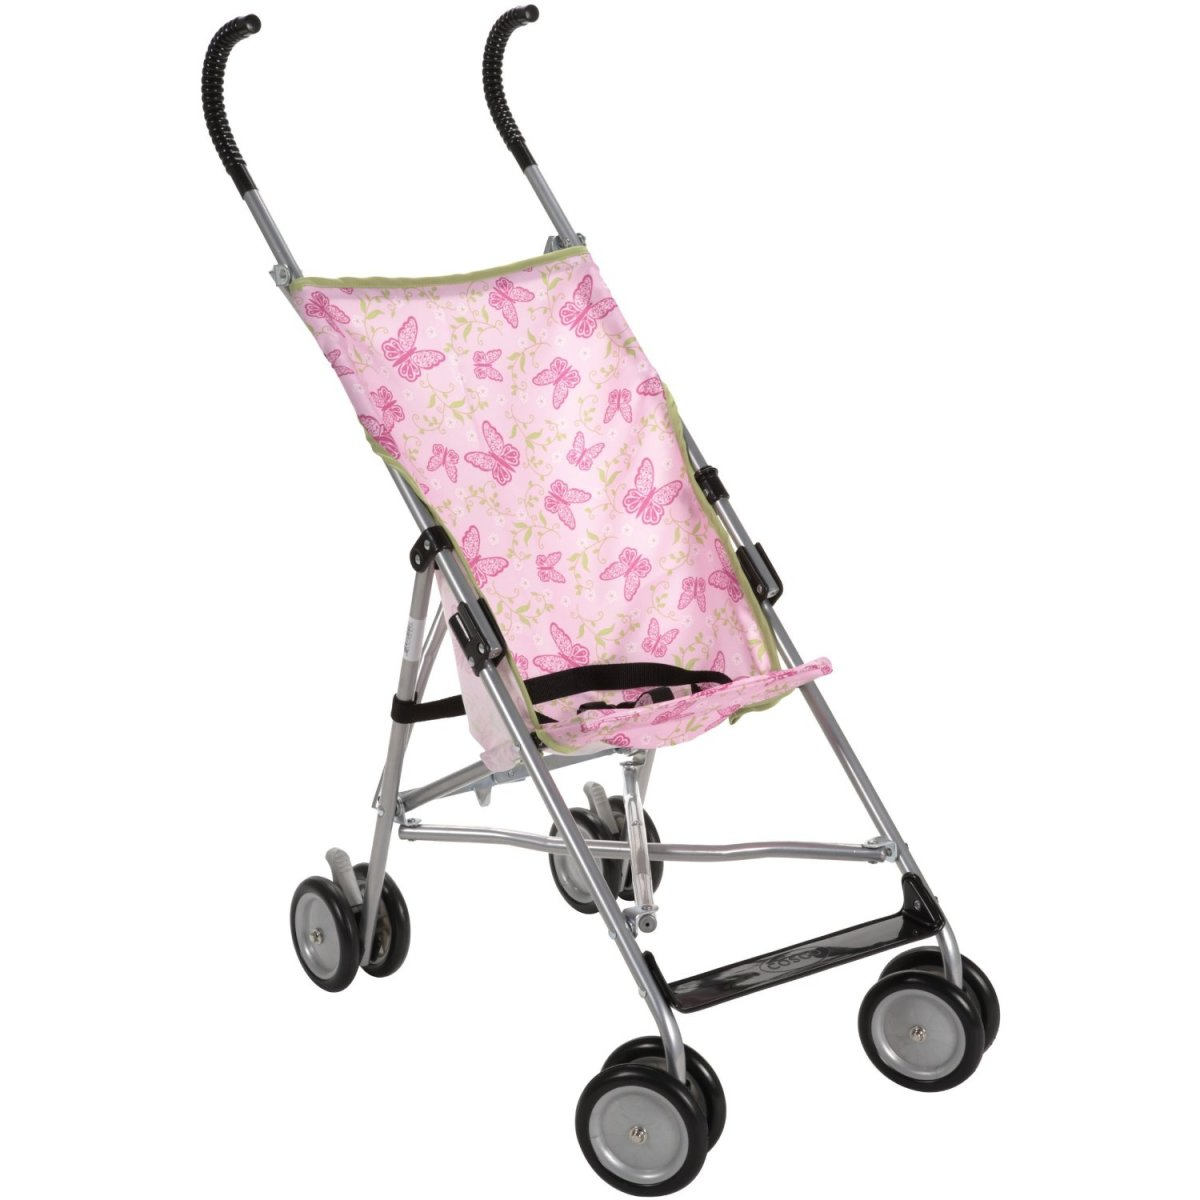 Cosco Umbrella Stroller Butterfly Dreams